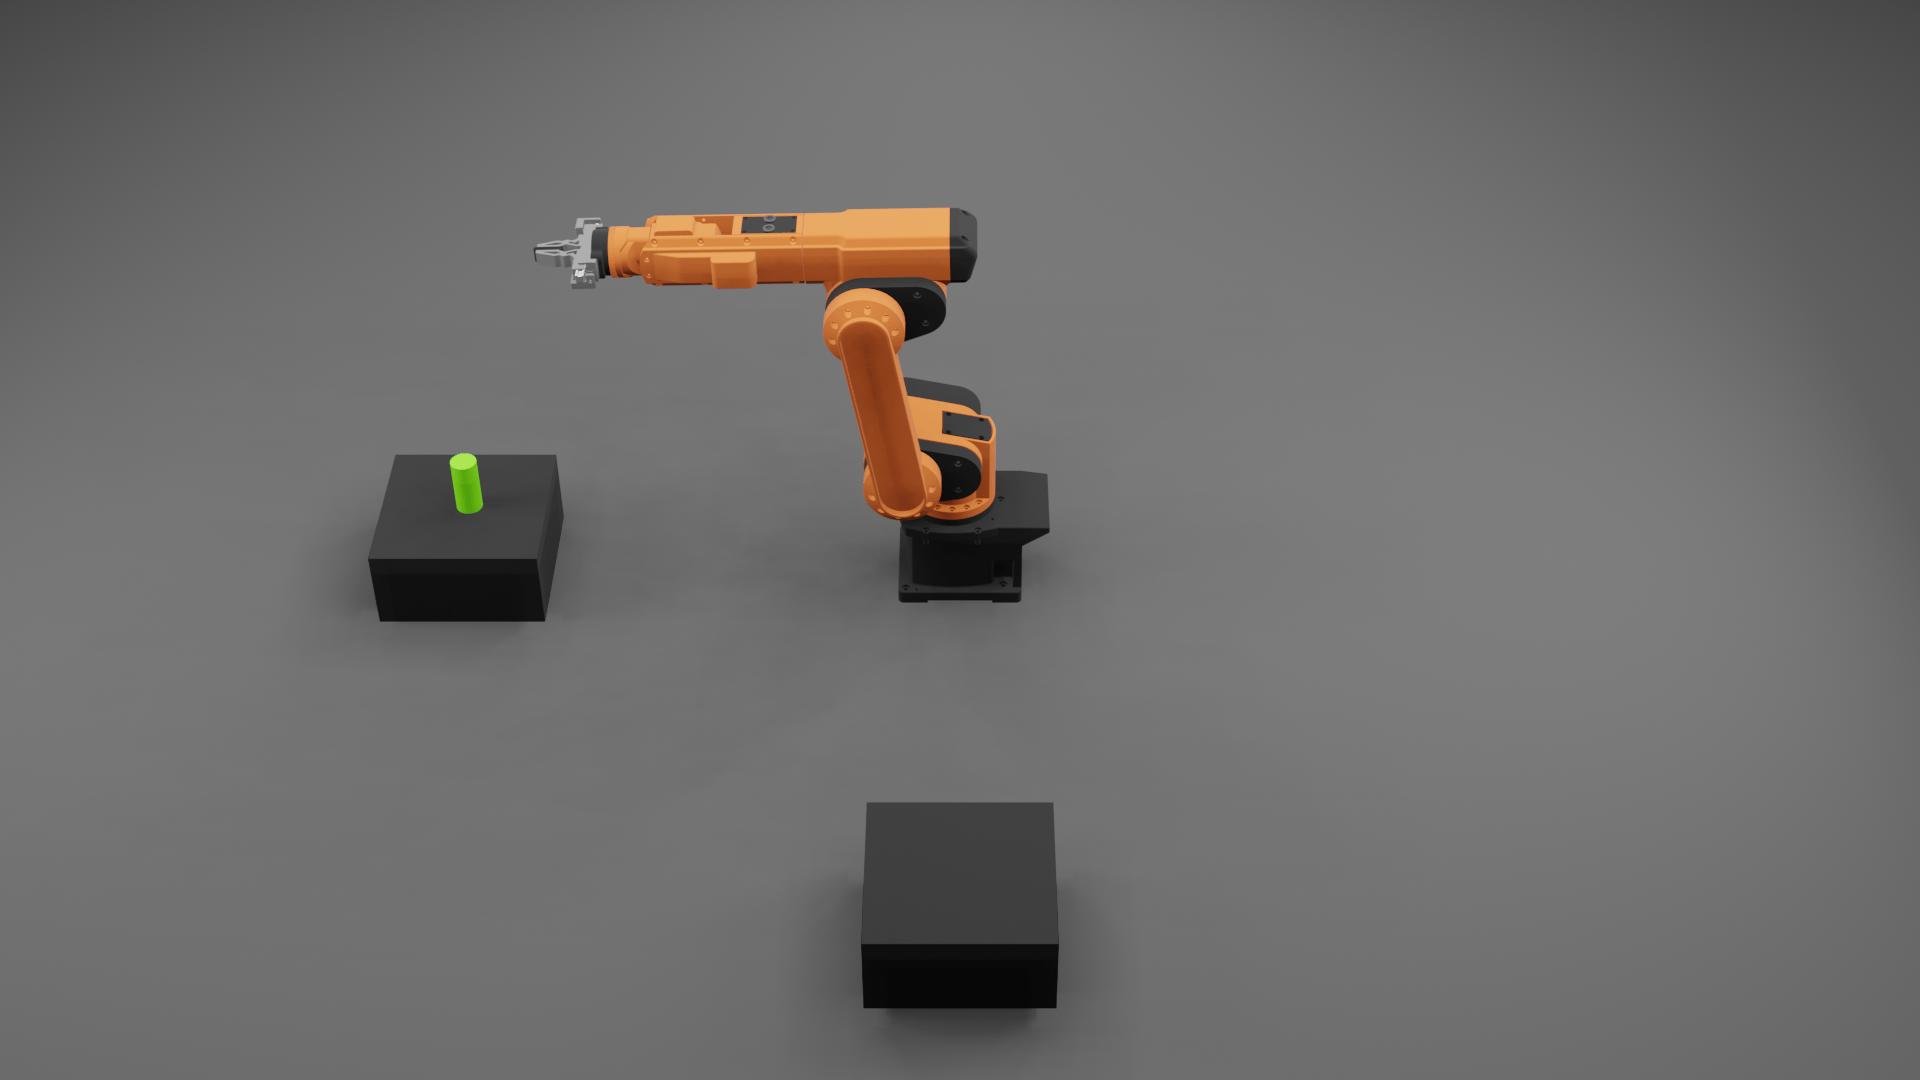 robot-prova-colore